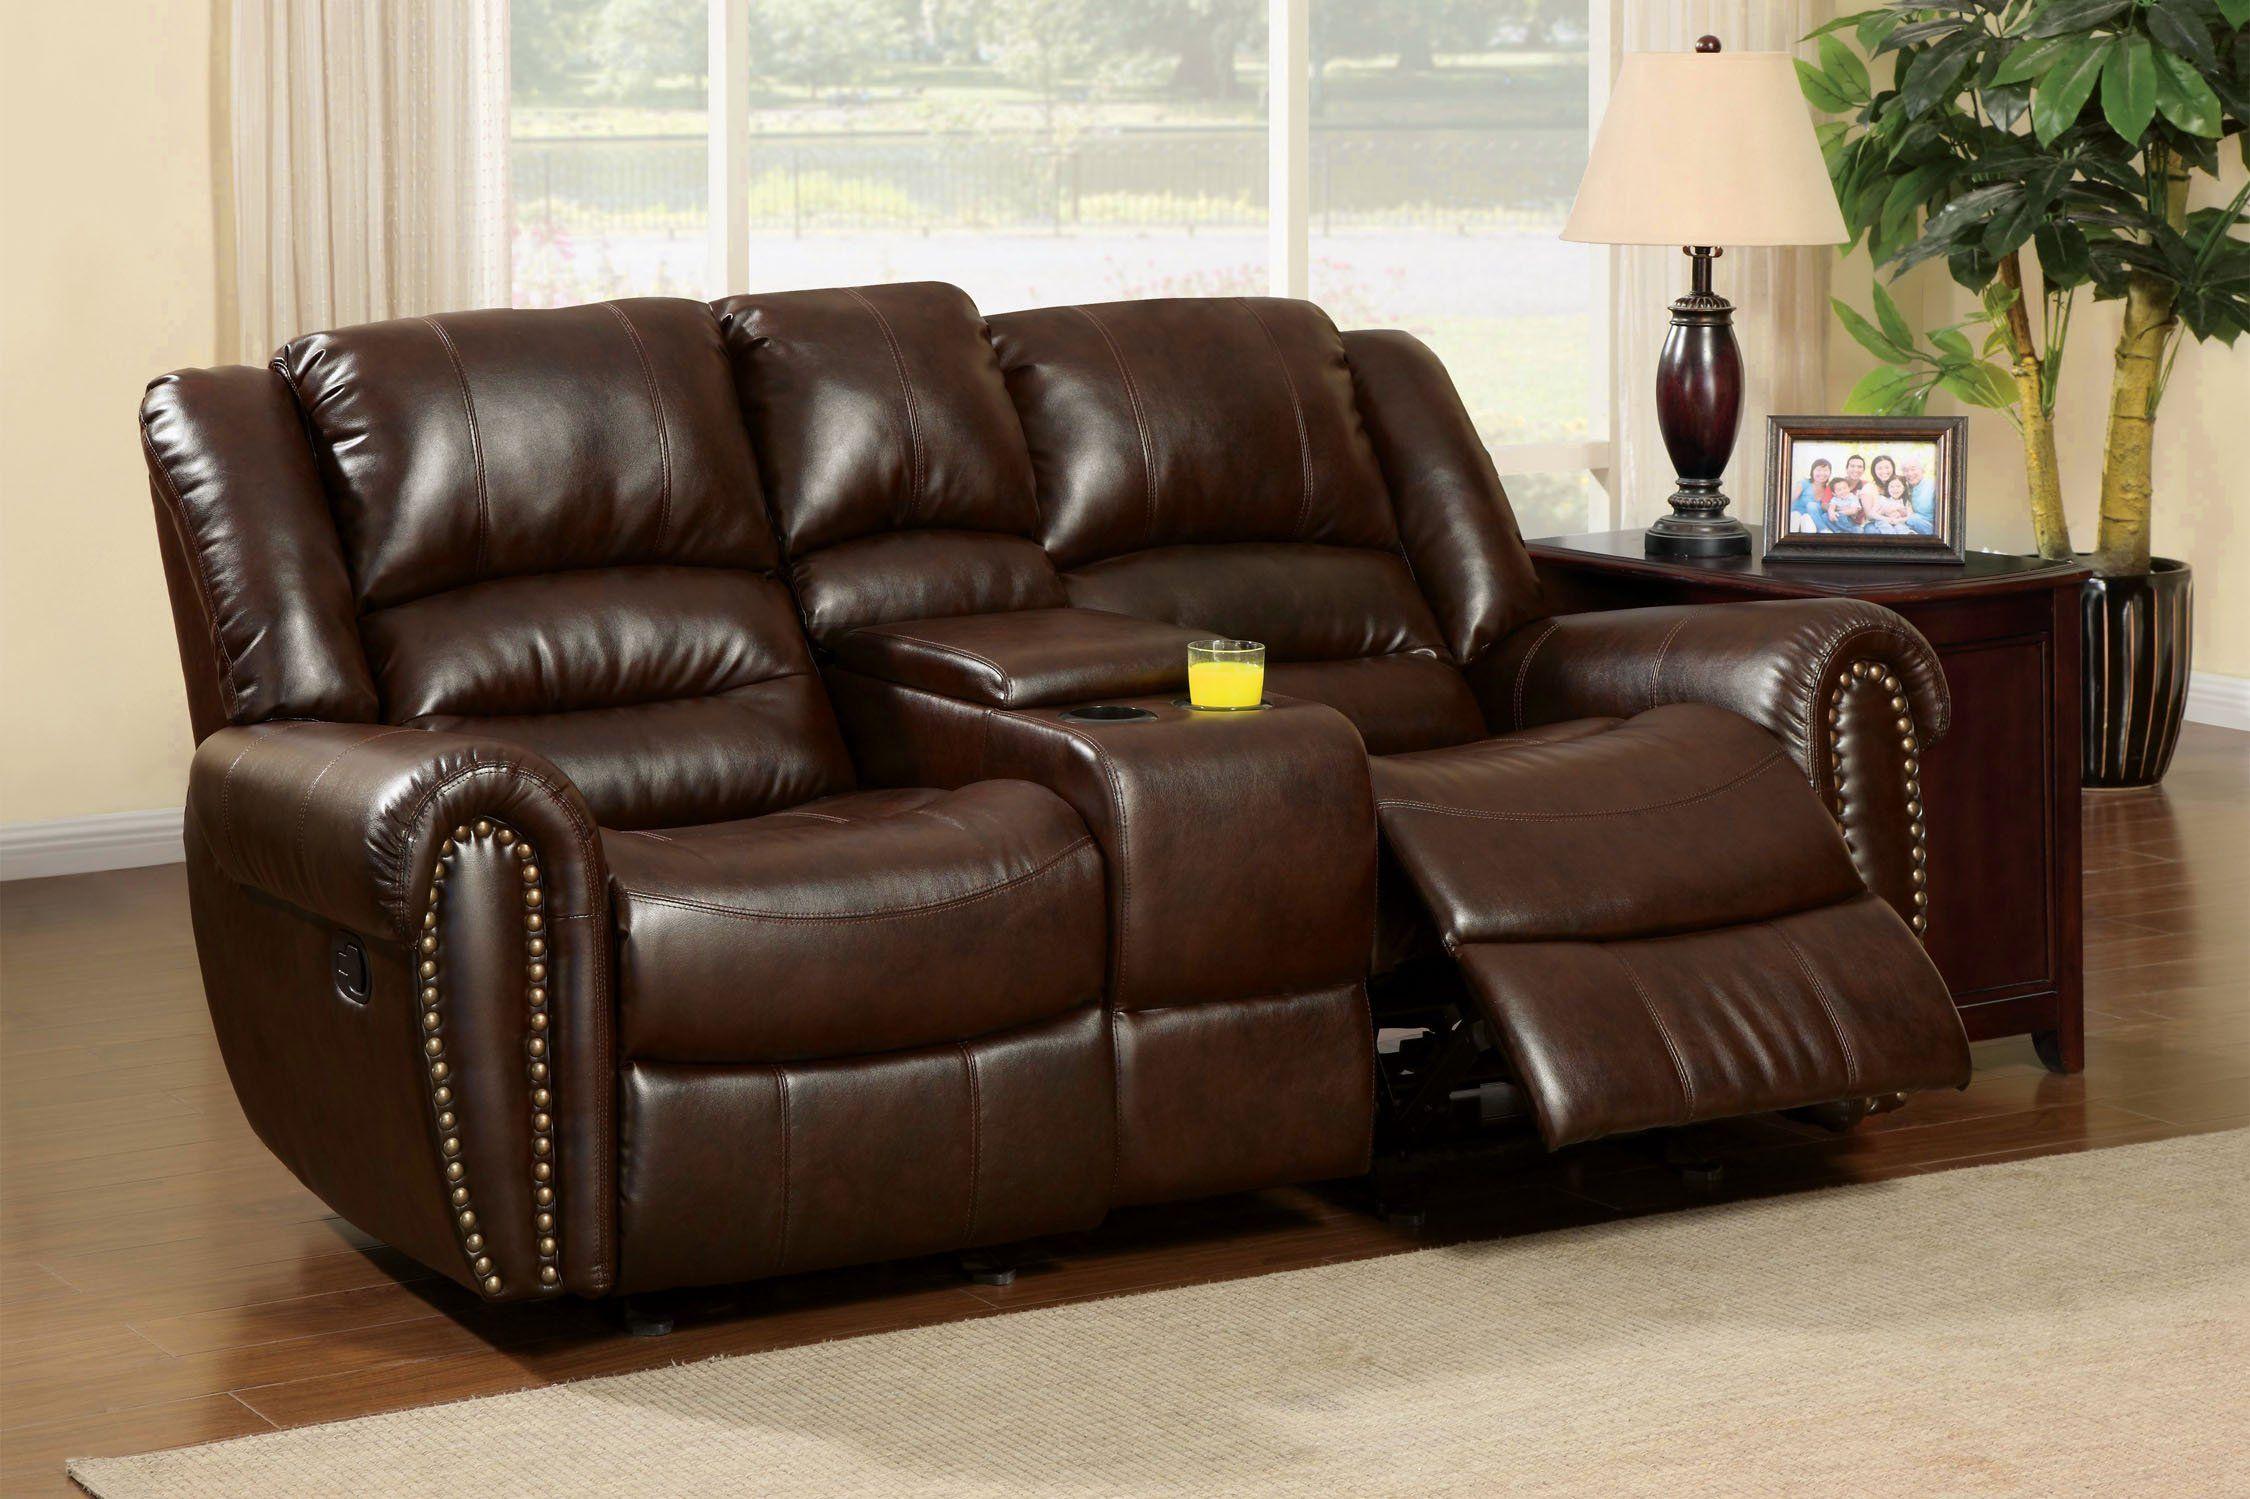 Surprising Damien Transitional Bonded Leather Loveseat Recliner With Inzonedesignstudio Interior Chair Design Inzonedesignstudiocom